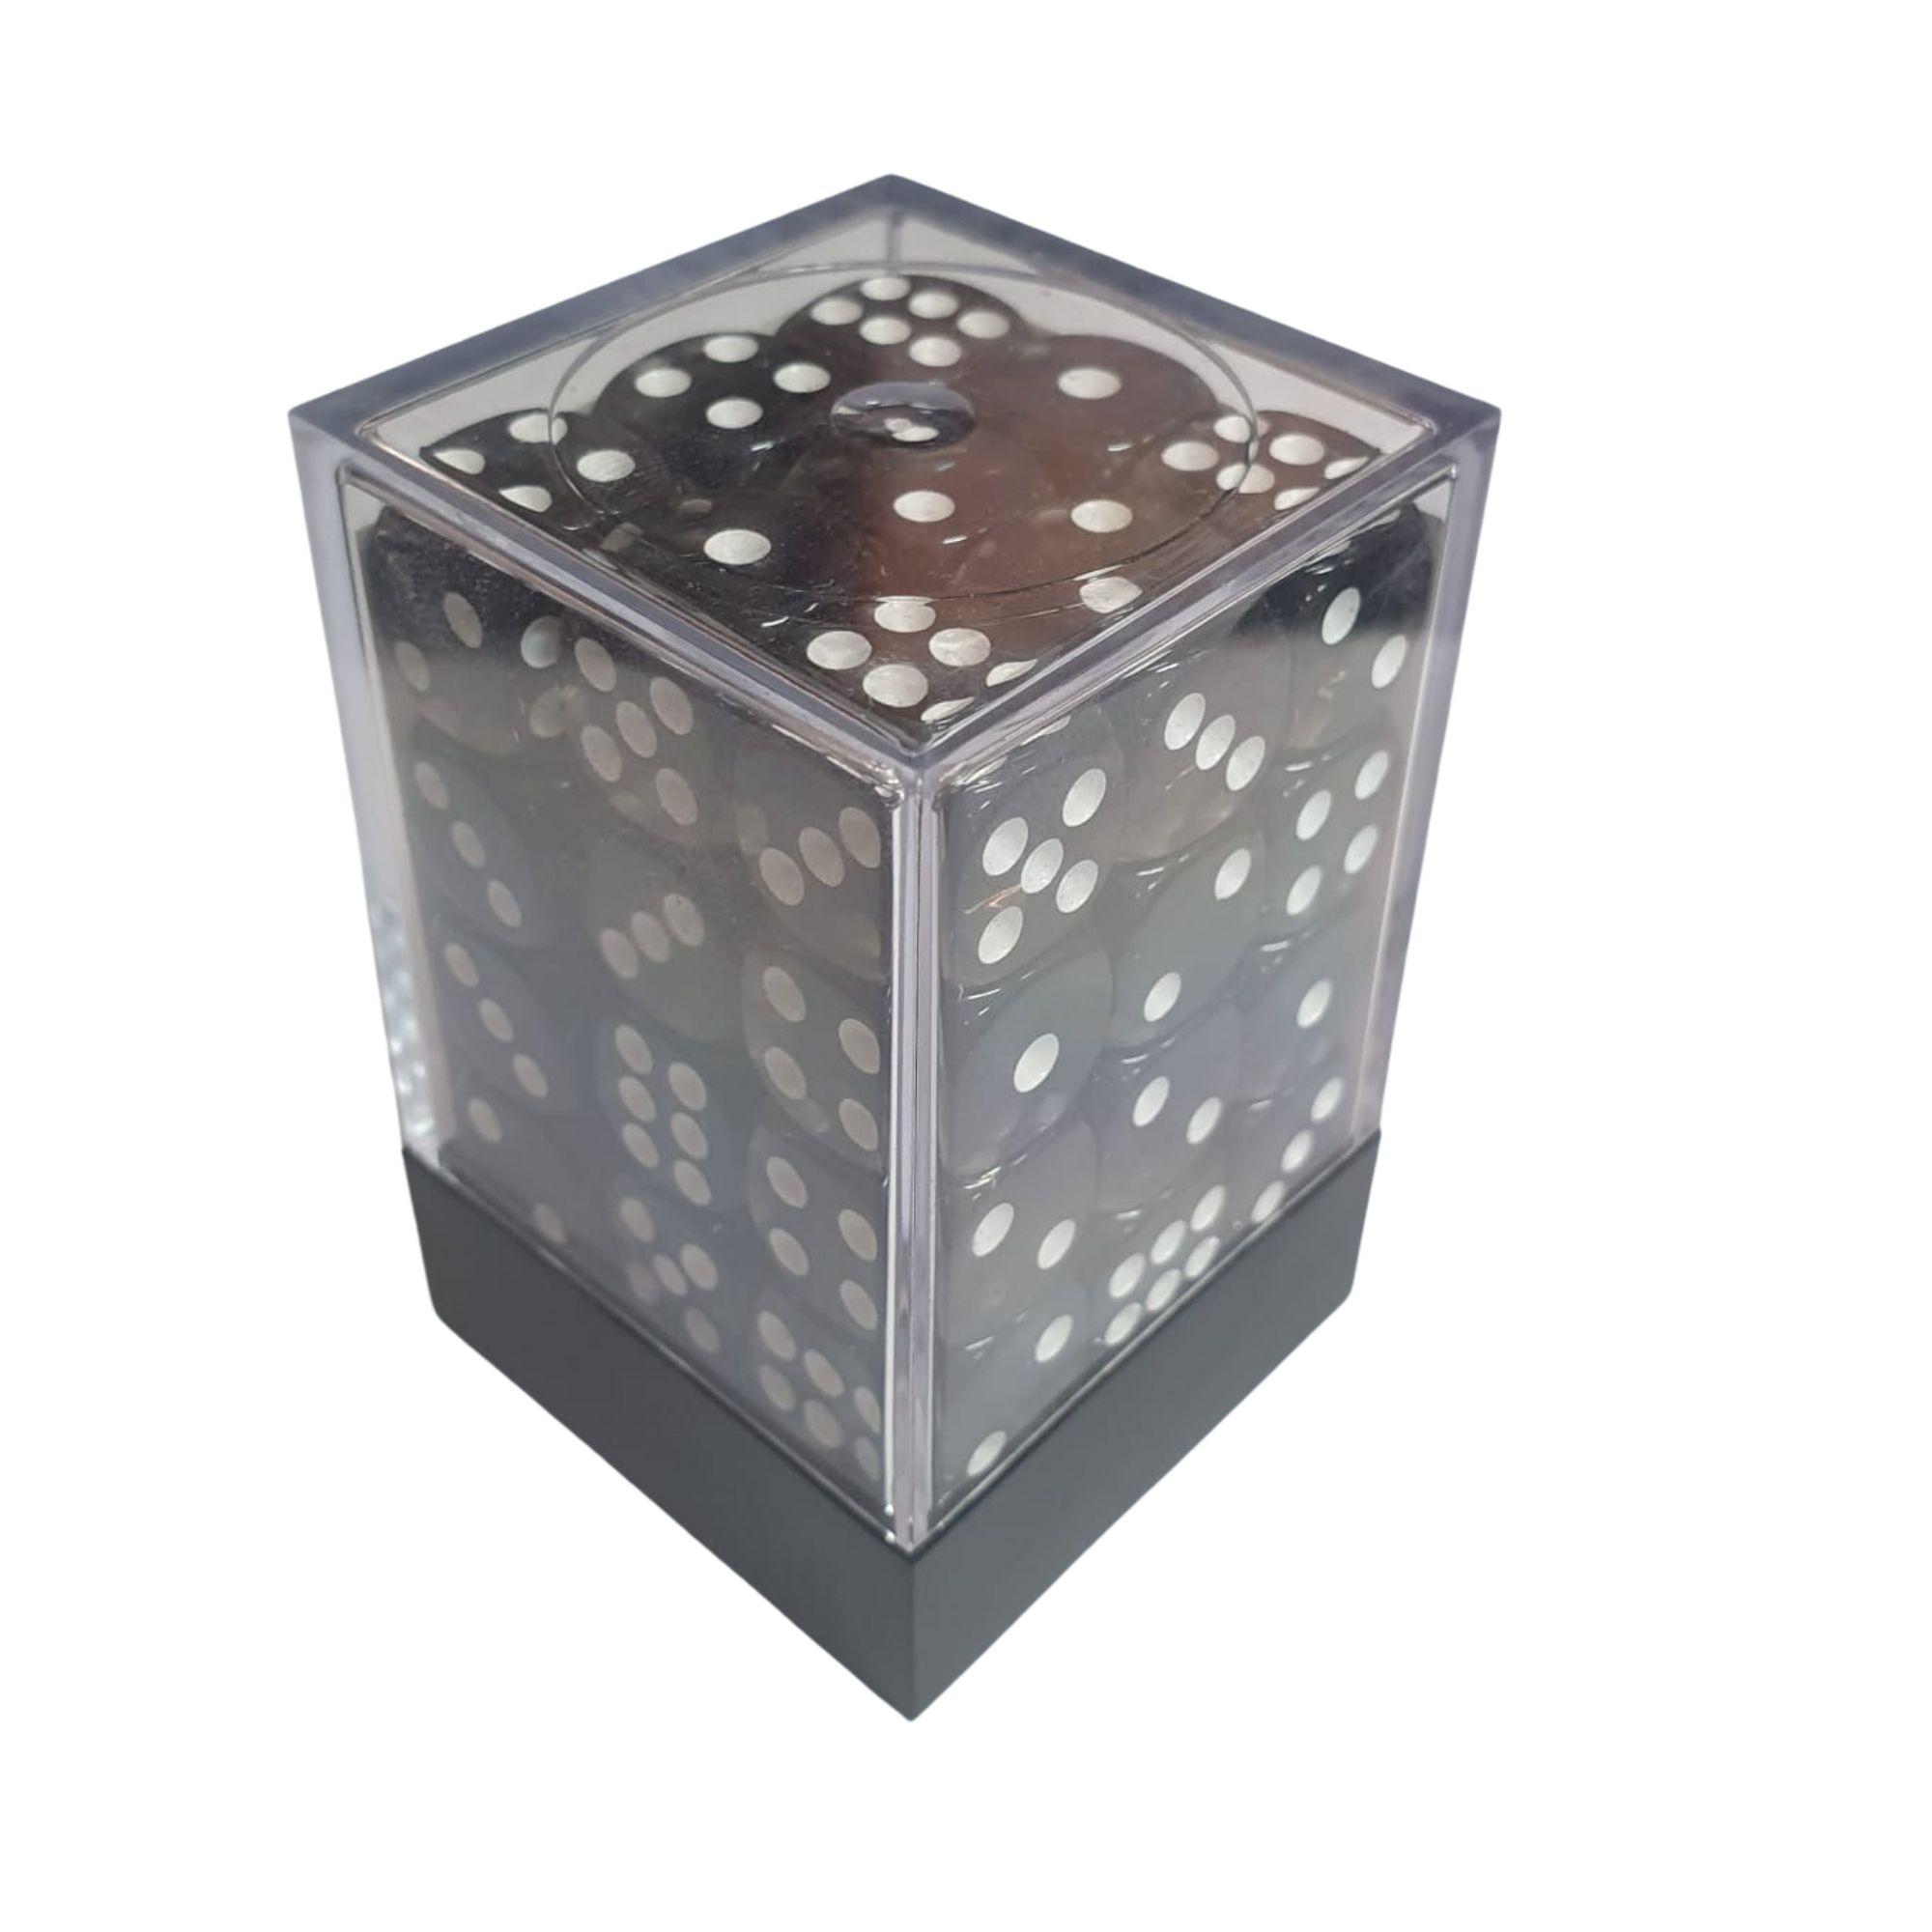 Central Dices Conjuntos 36 Dados D6 Translúcido Preto e Branco